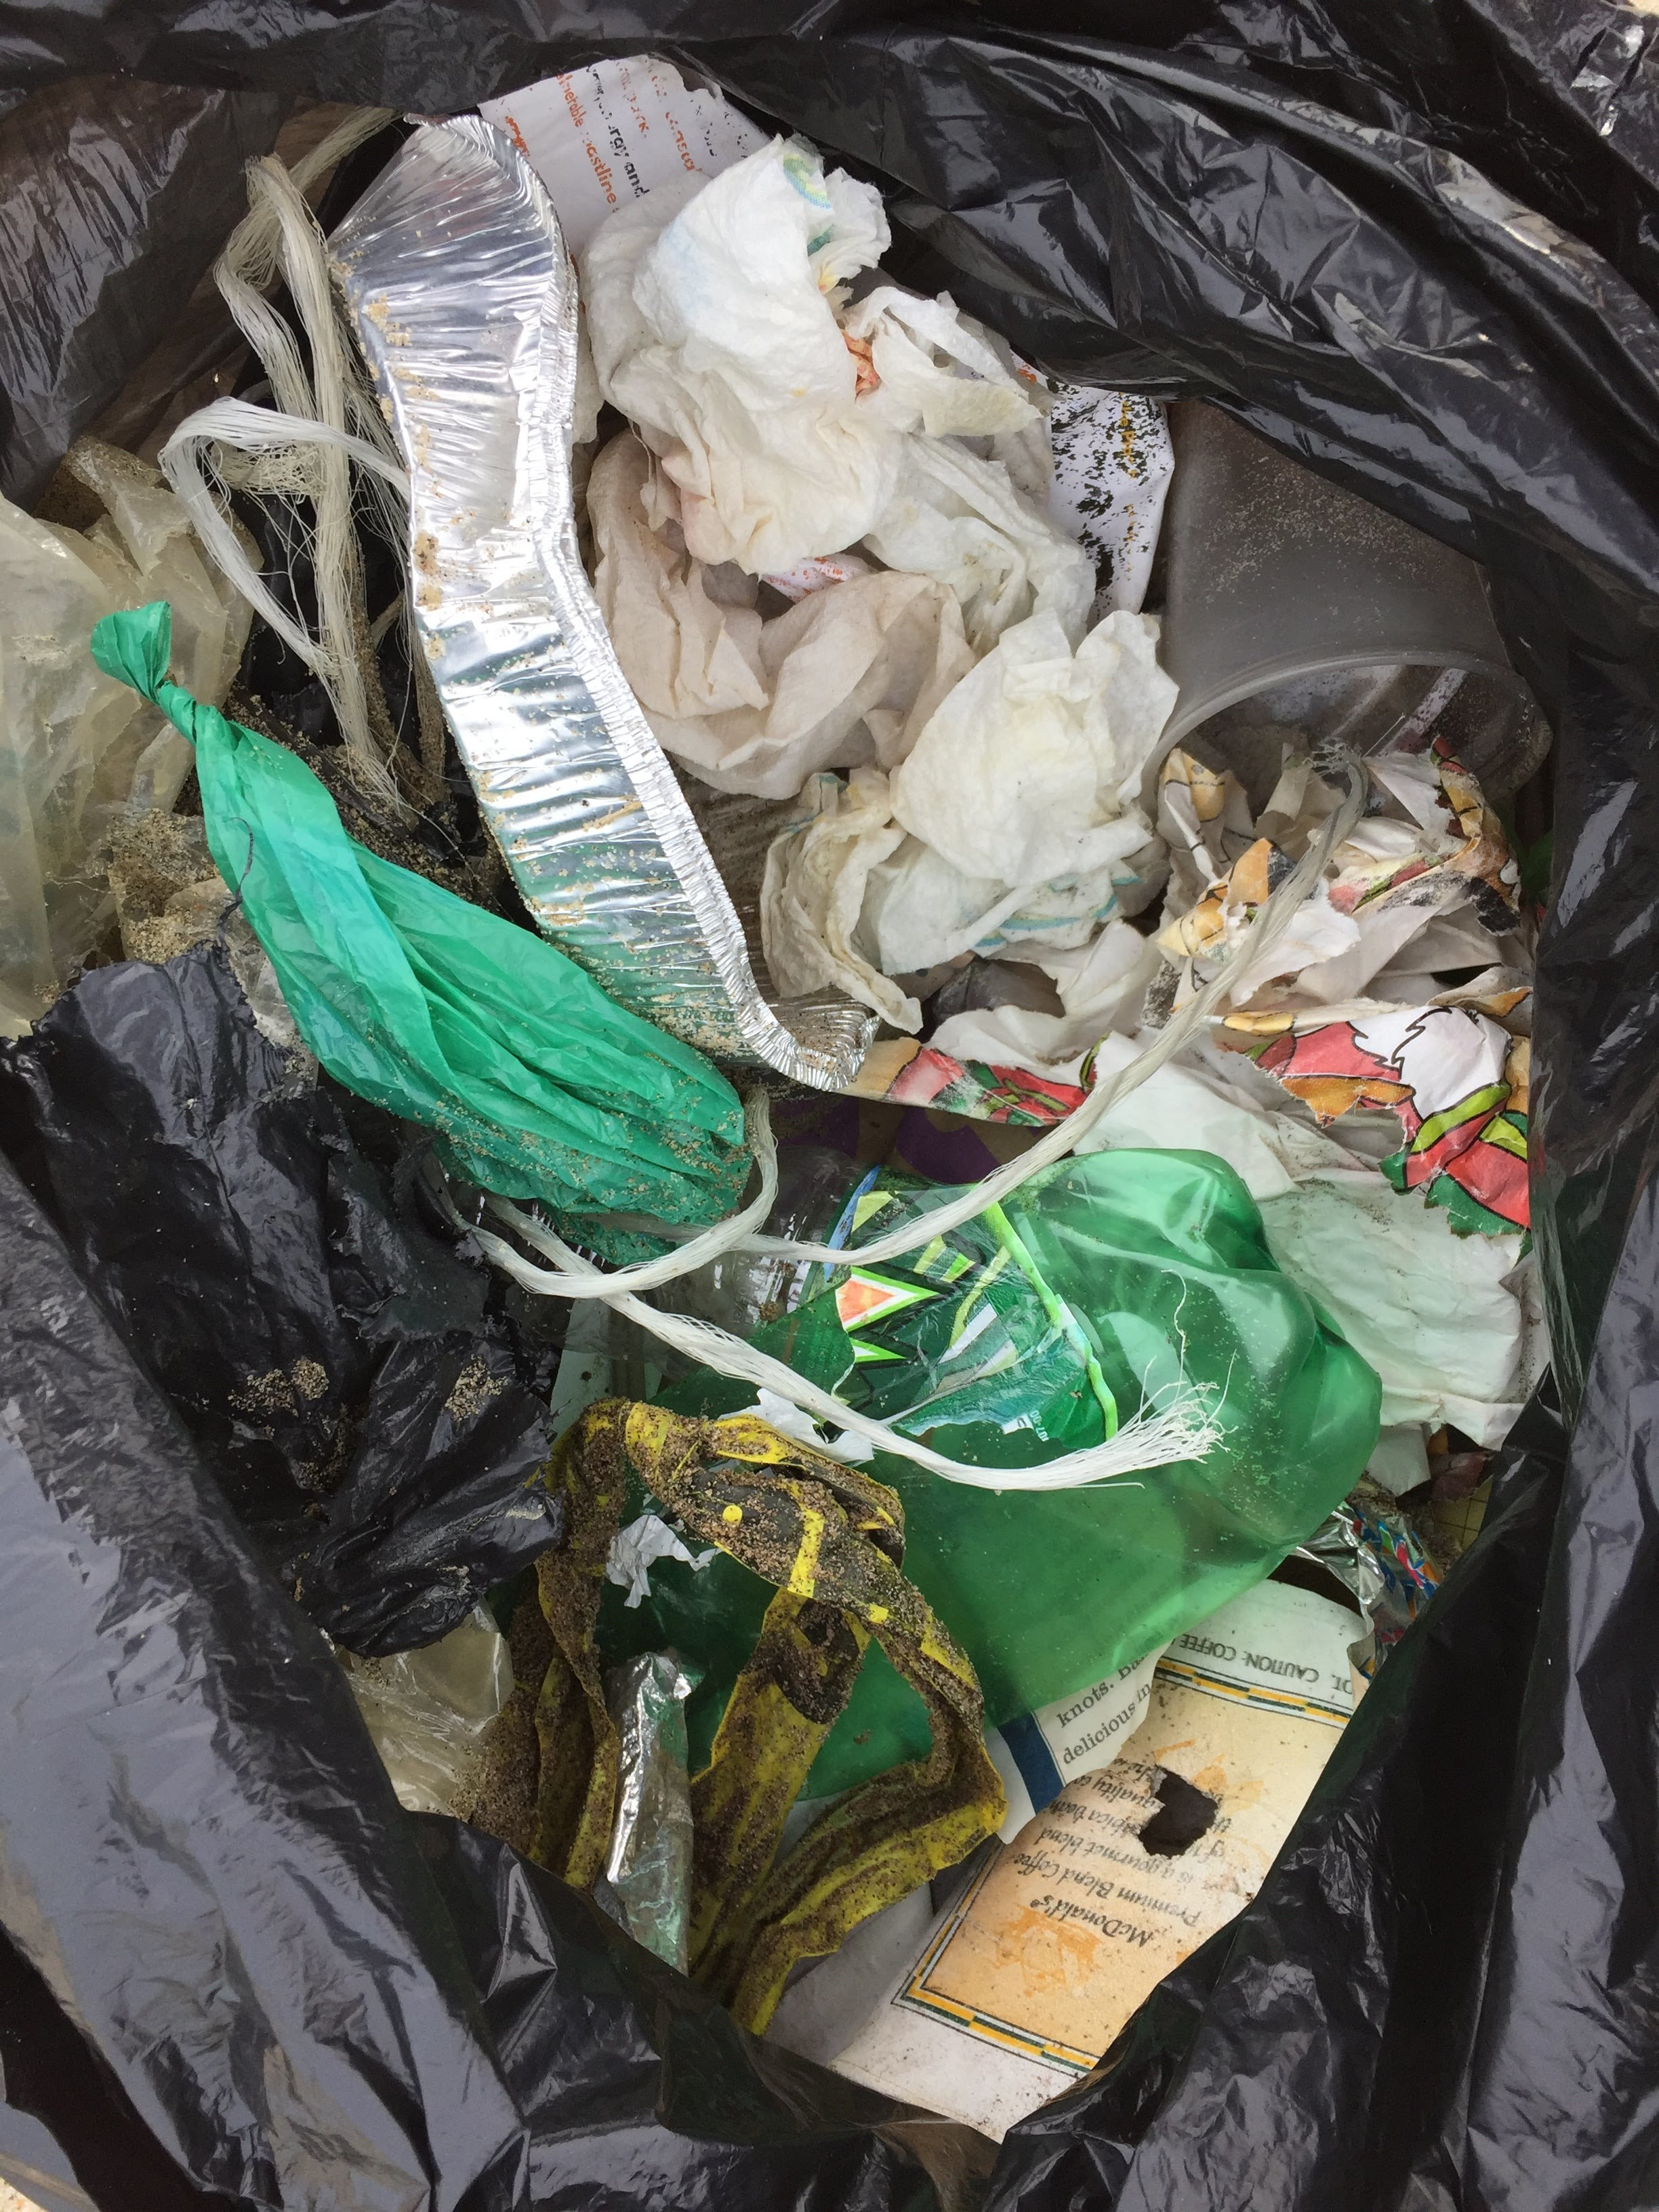 amy_chen_design_surfrider_asbury_park_new_jersey_beach_clean_plastic_trash_bag.JPG